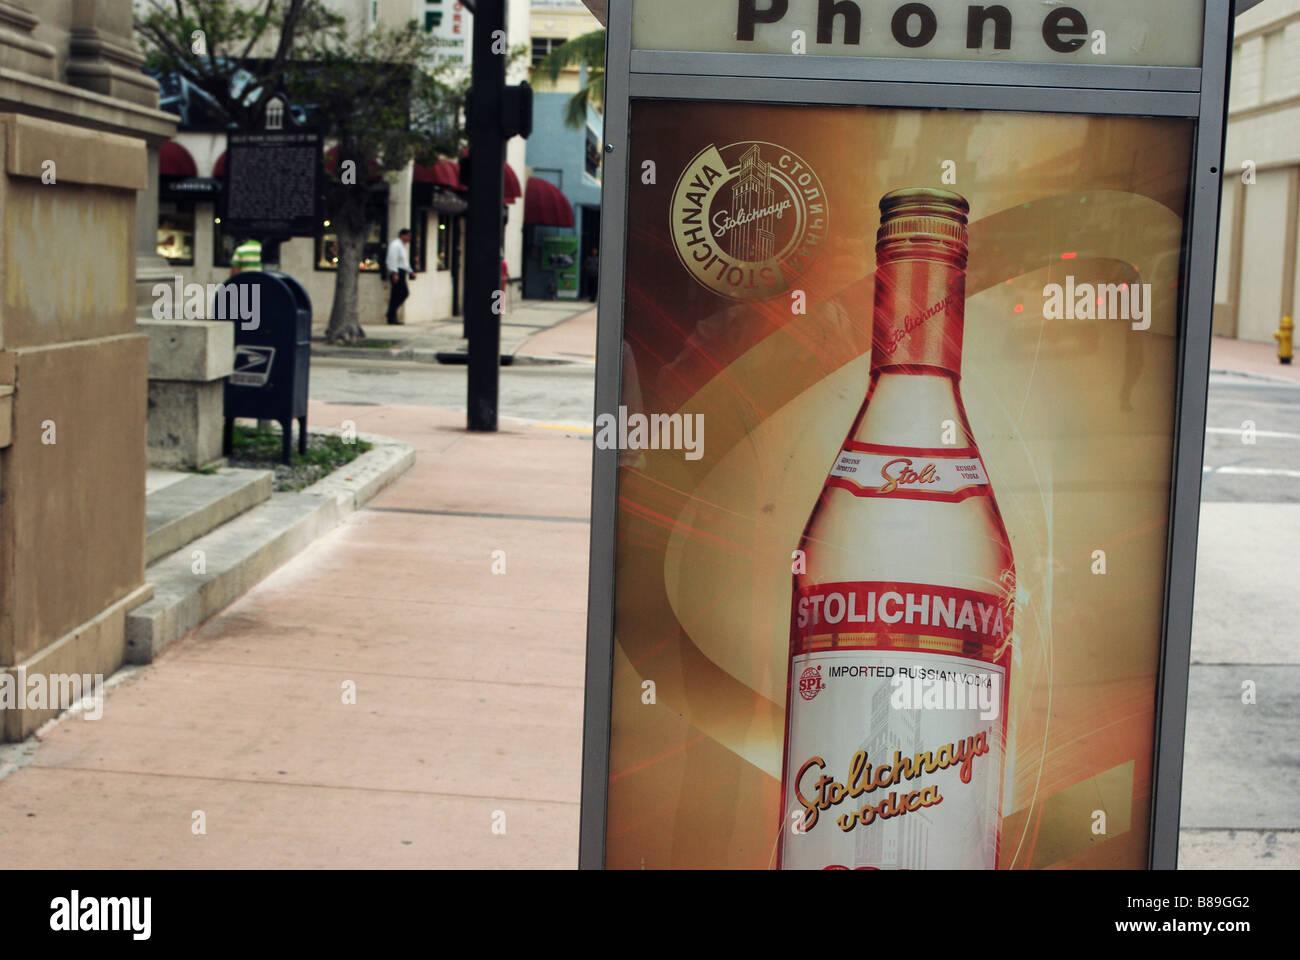 Stolichnaya Vodka Ad on NE 1st Street in Downtown Miami - Stock Image